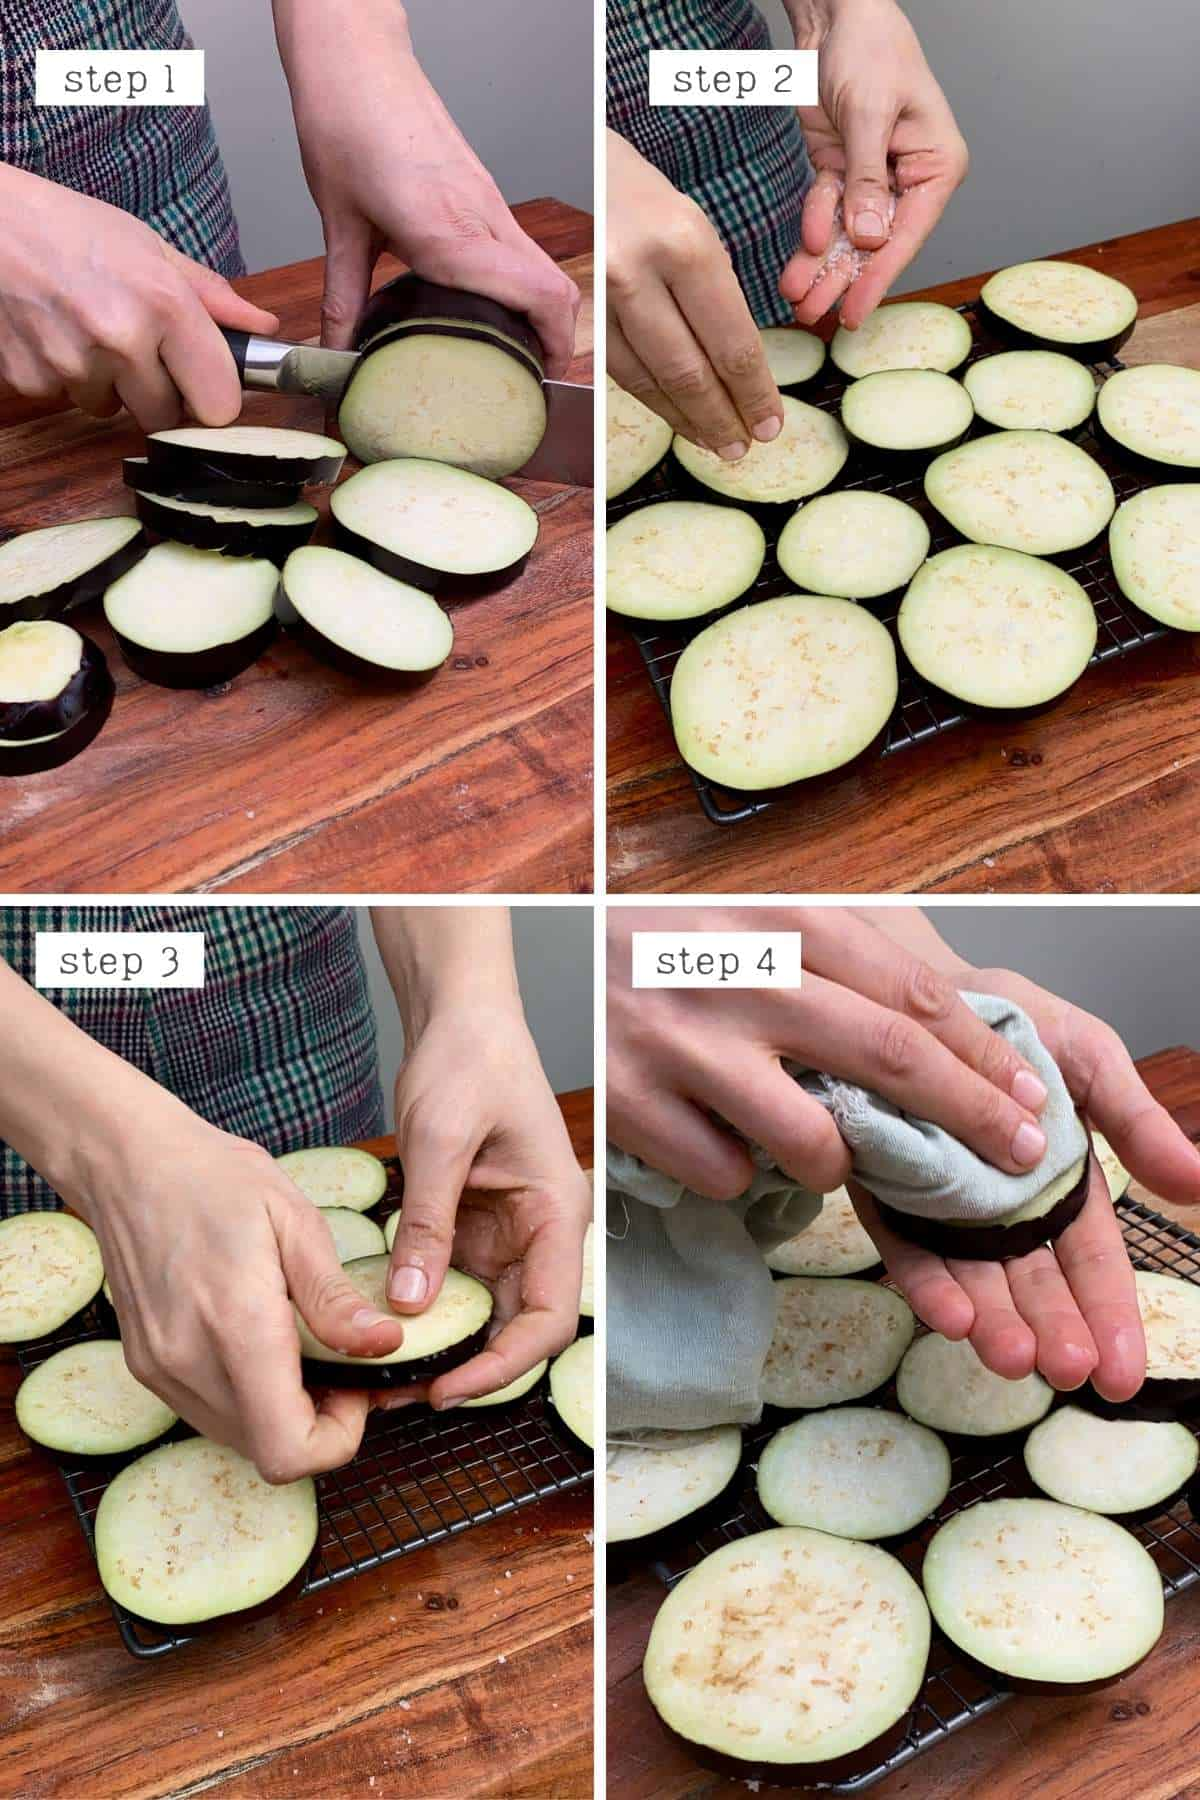 Steps for preparing eggplant